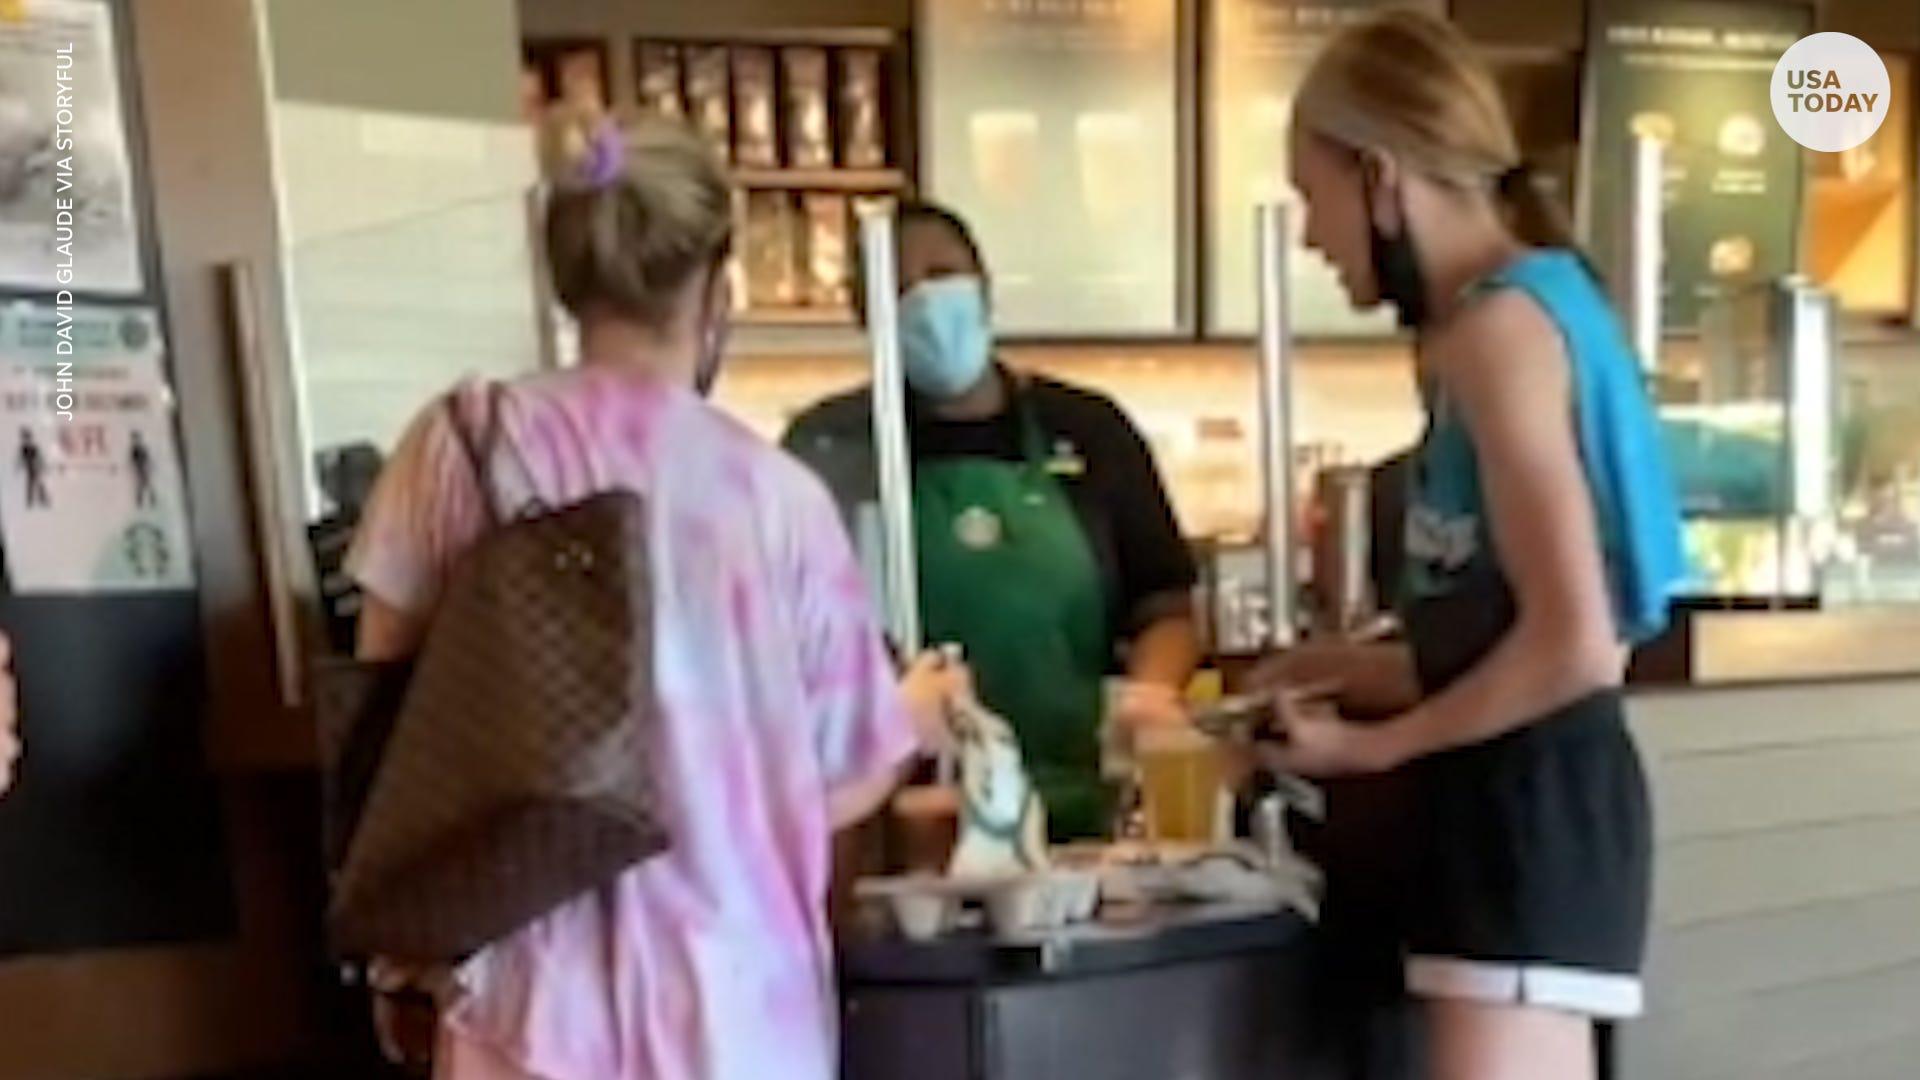 Customer goes on profane tirade, refuses to wear mask in California Starbucks